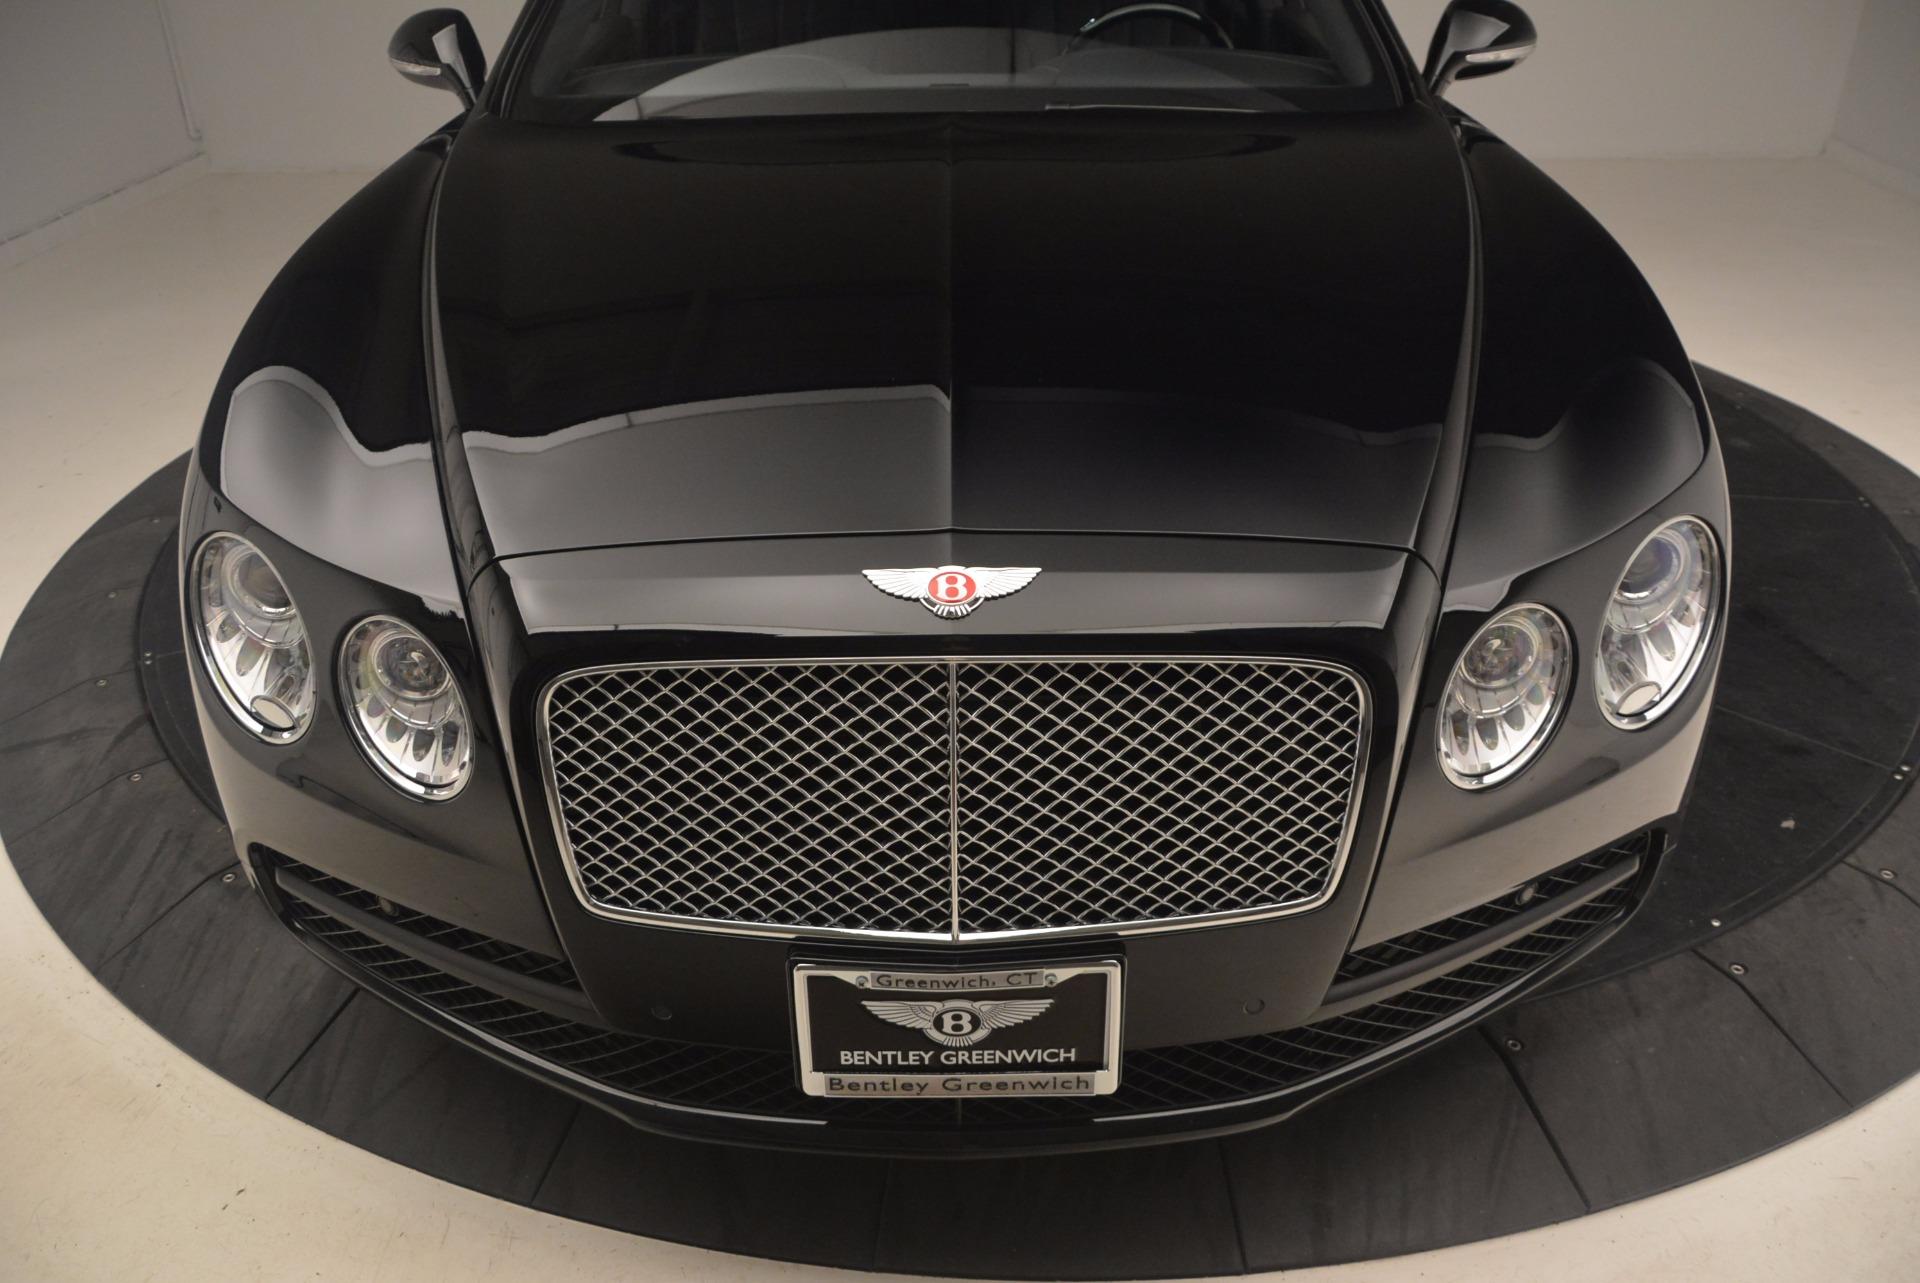 Used 2015 Bentley Flying Spur V8 For Sale In Westport, CT 1199_p13